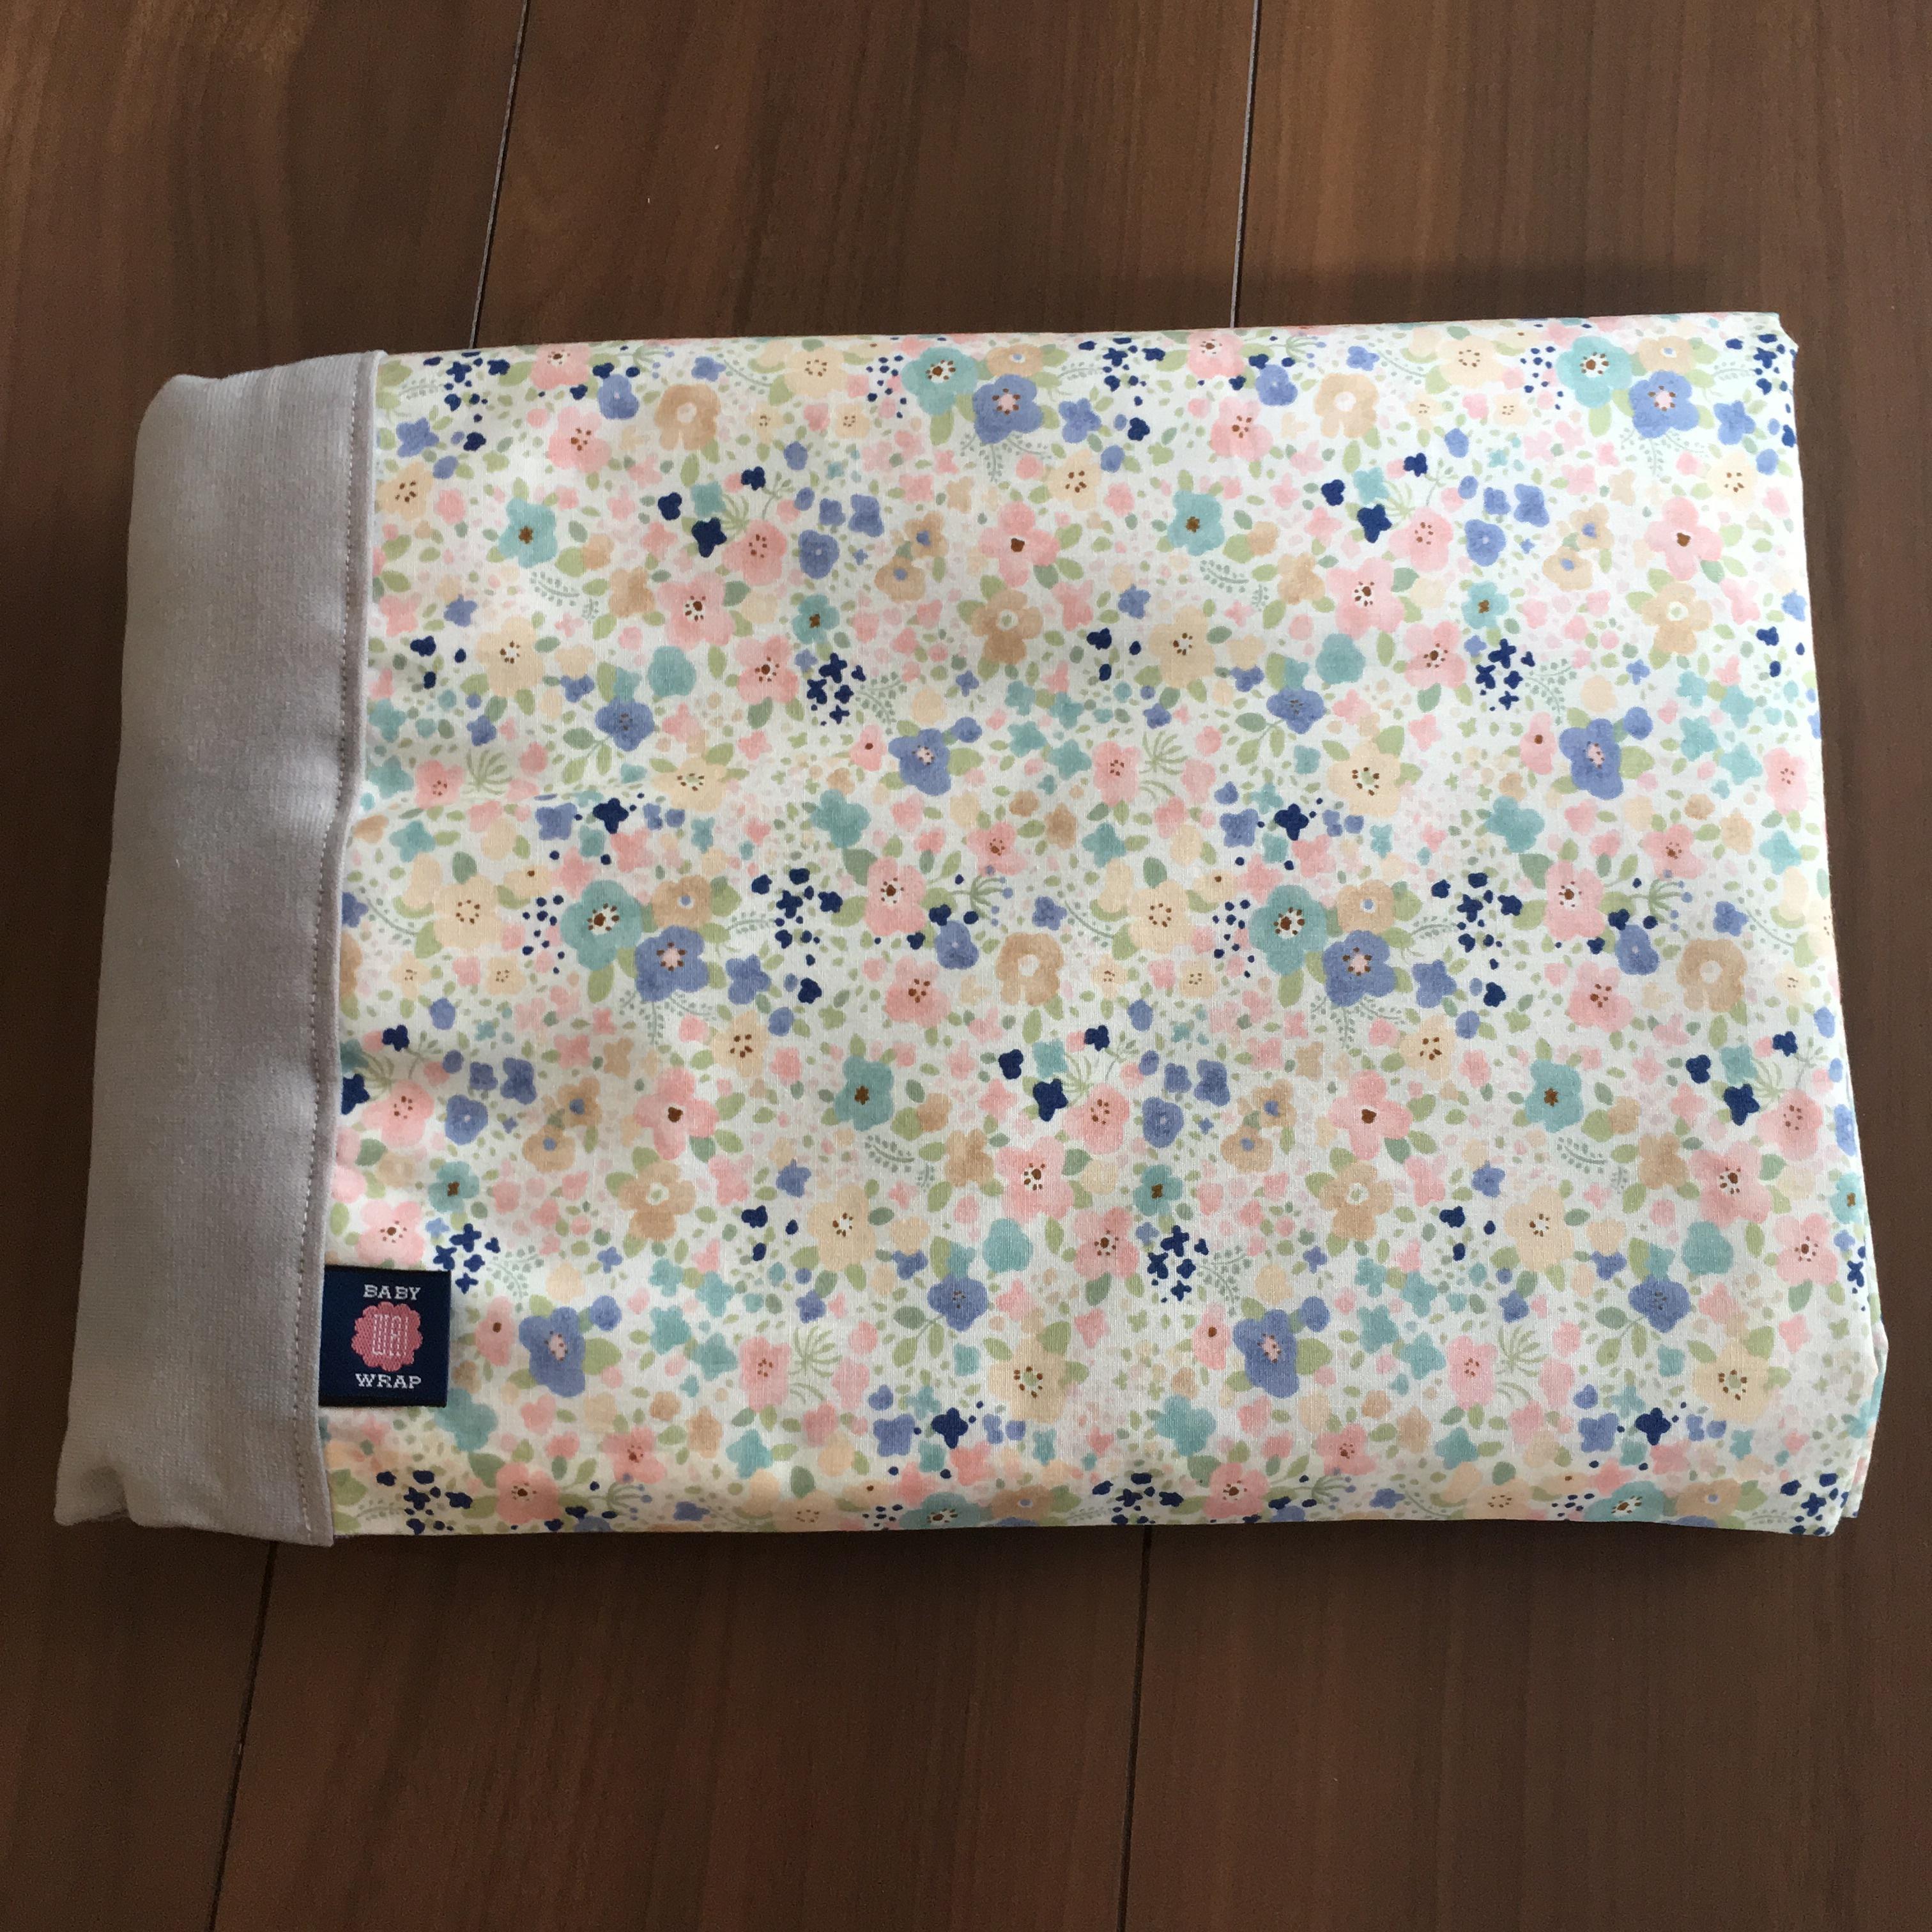 WA wrap /  ピンク・水色・グレー小花